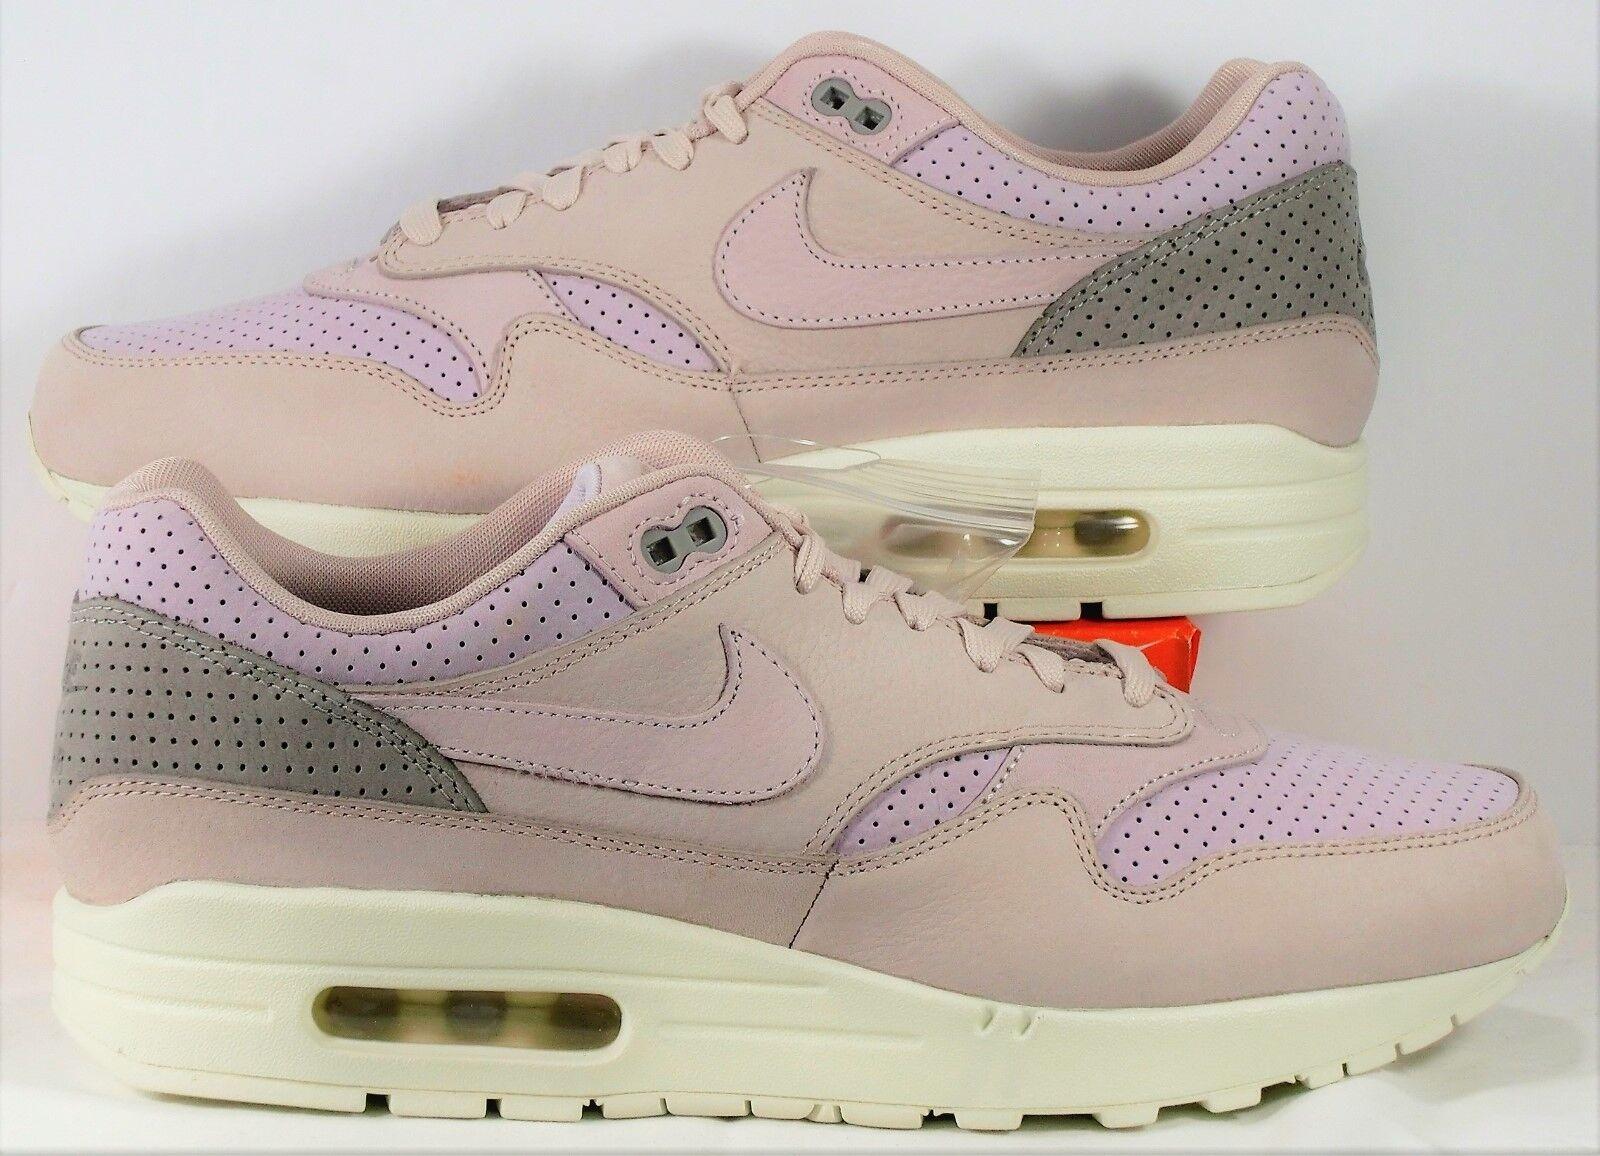 Nike air max 1 nikelab pinnacle schlamm ROT & pearl pink sz 10,5 neue 859554 600